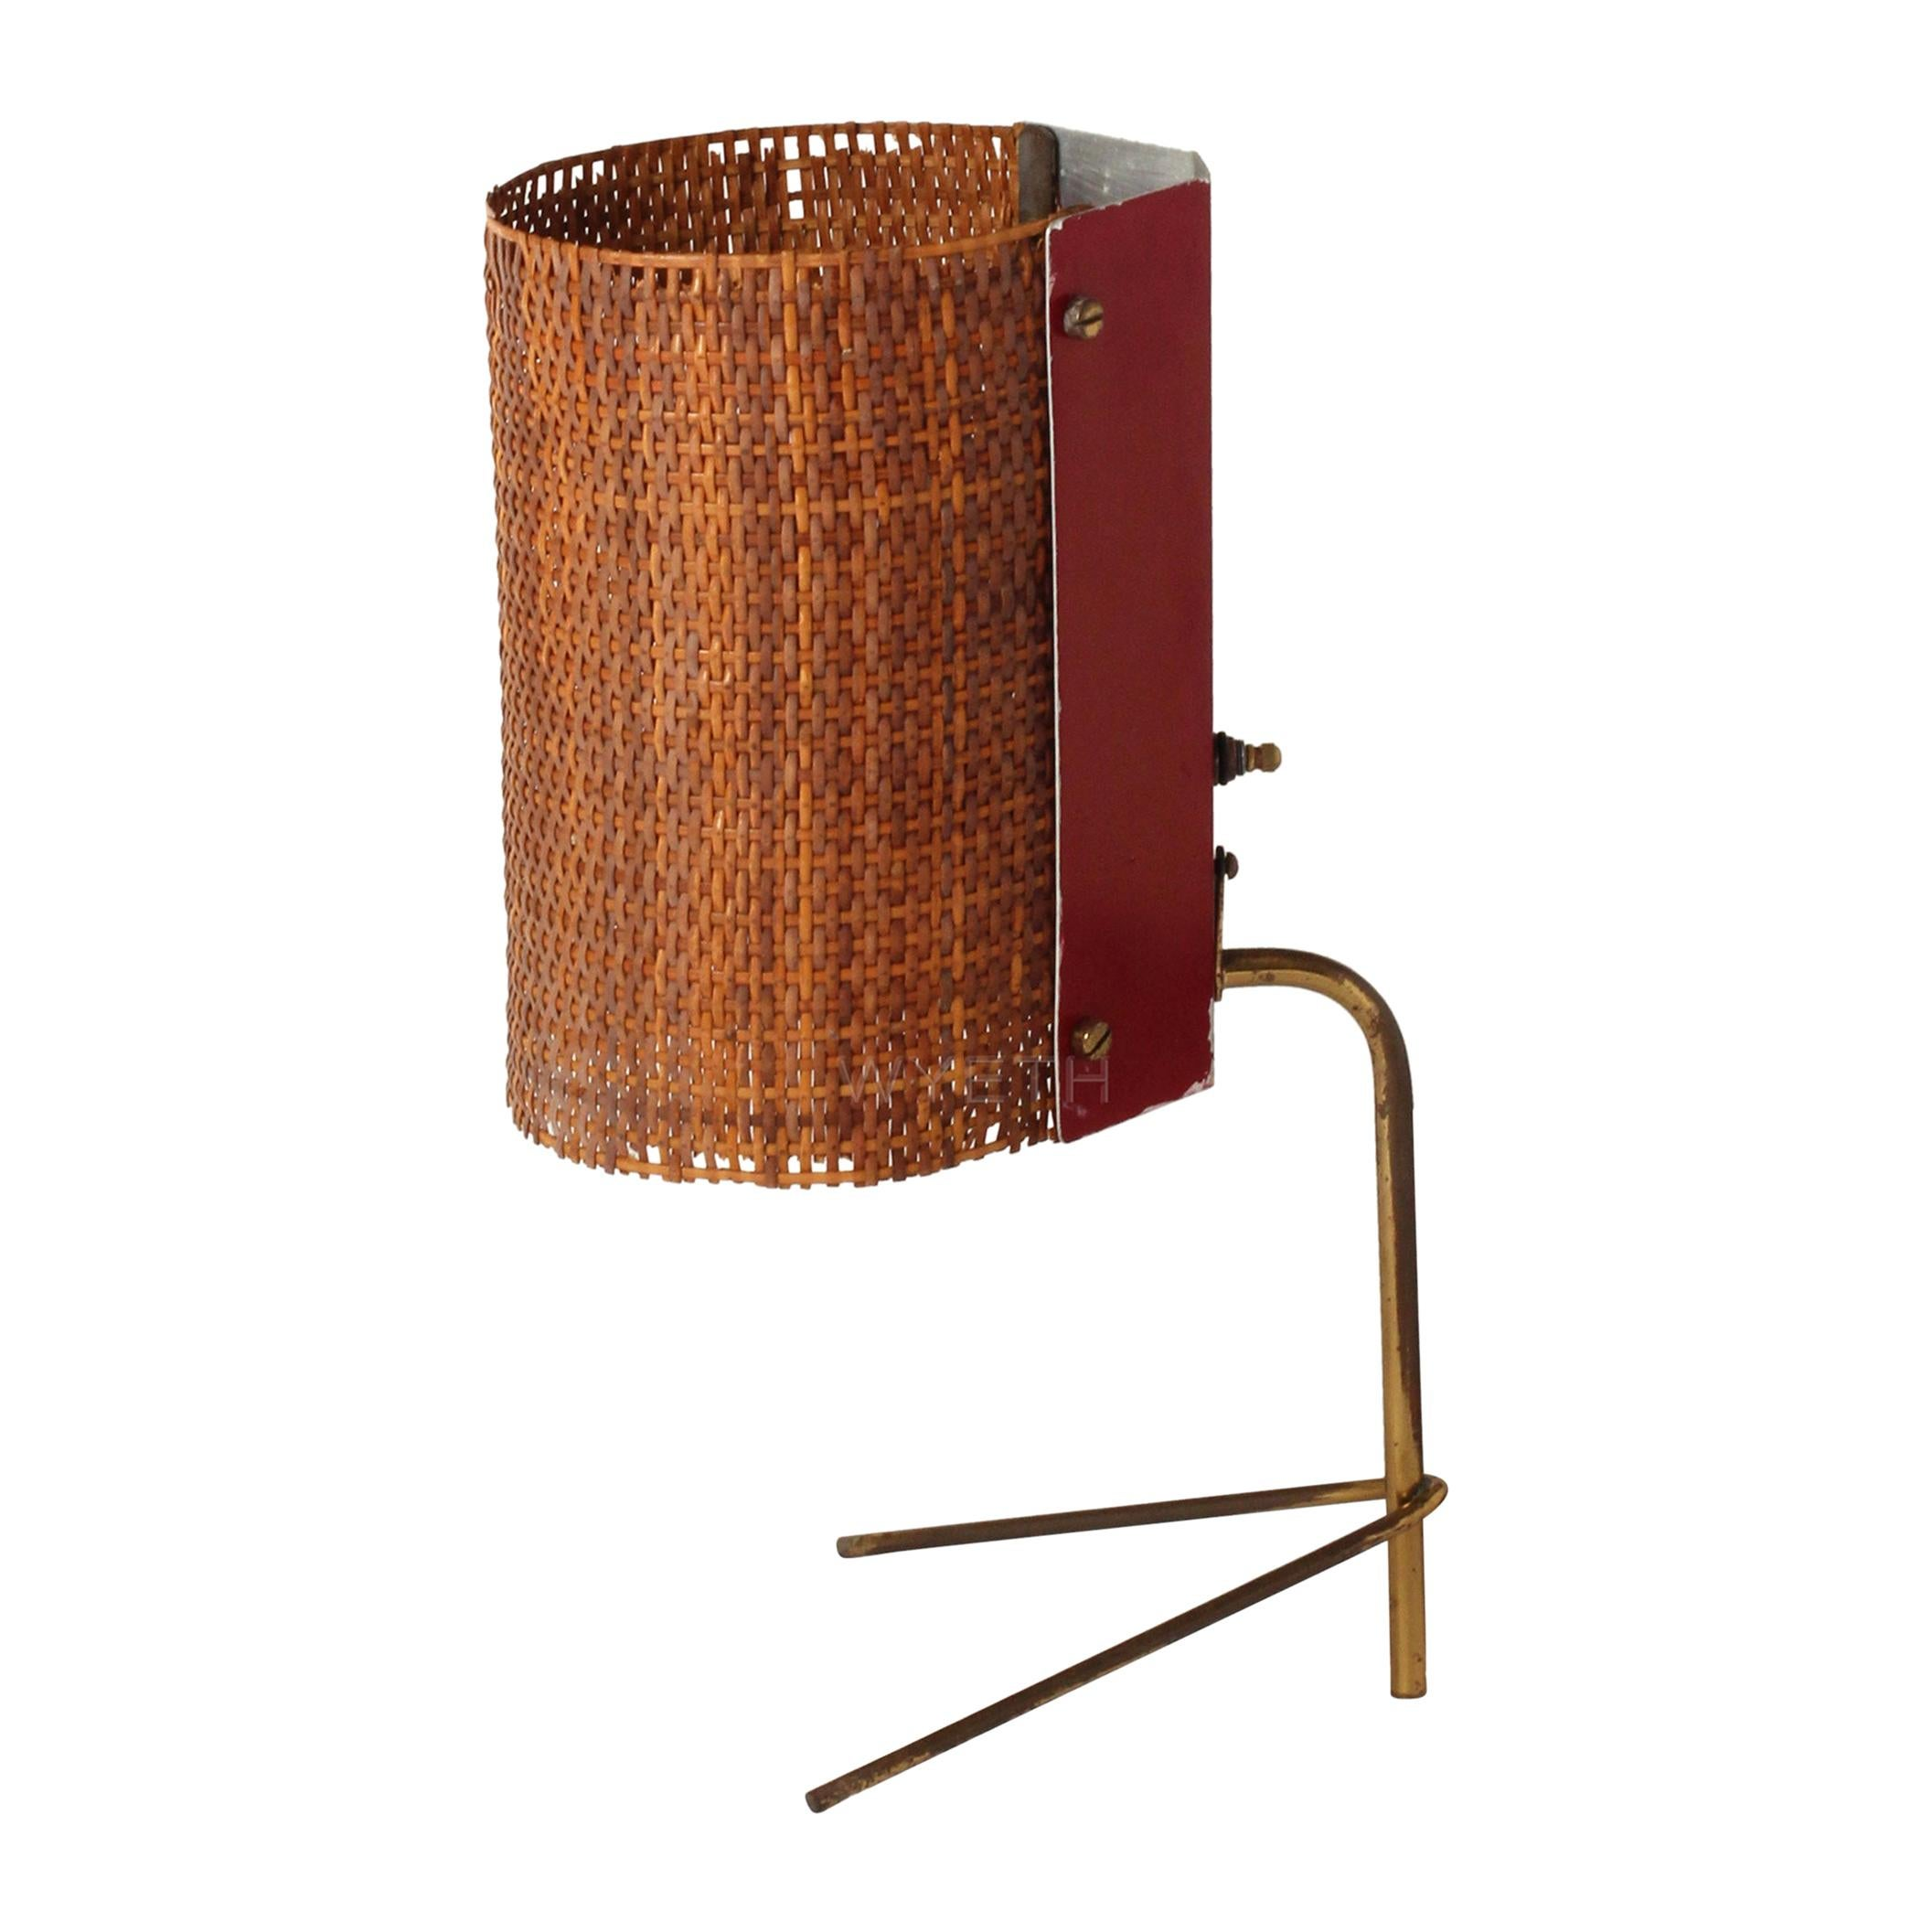 1950s Italian Modernist Table Lamp by Raymor